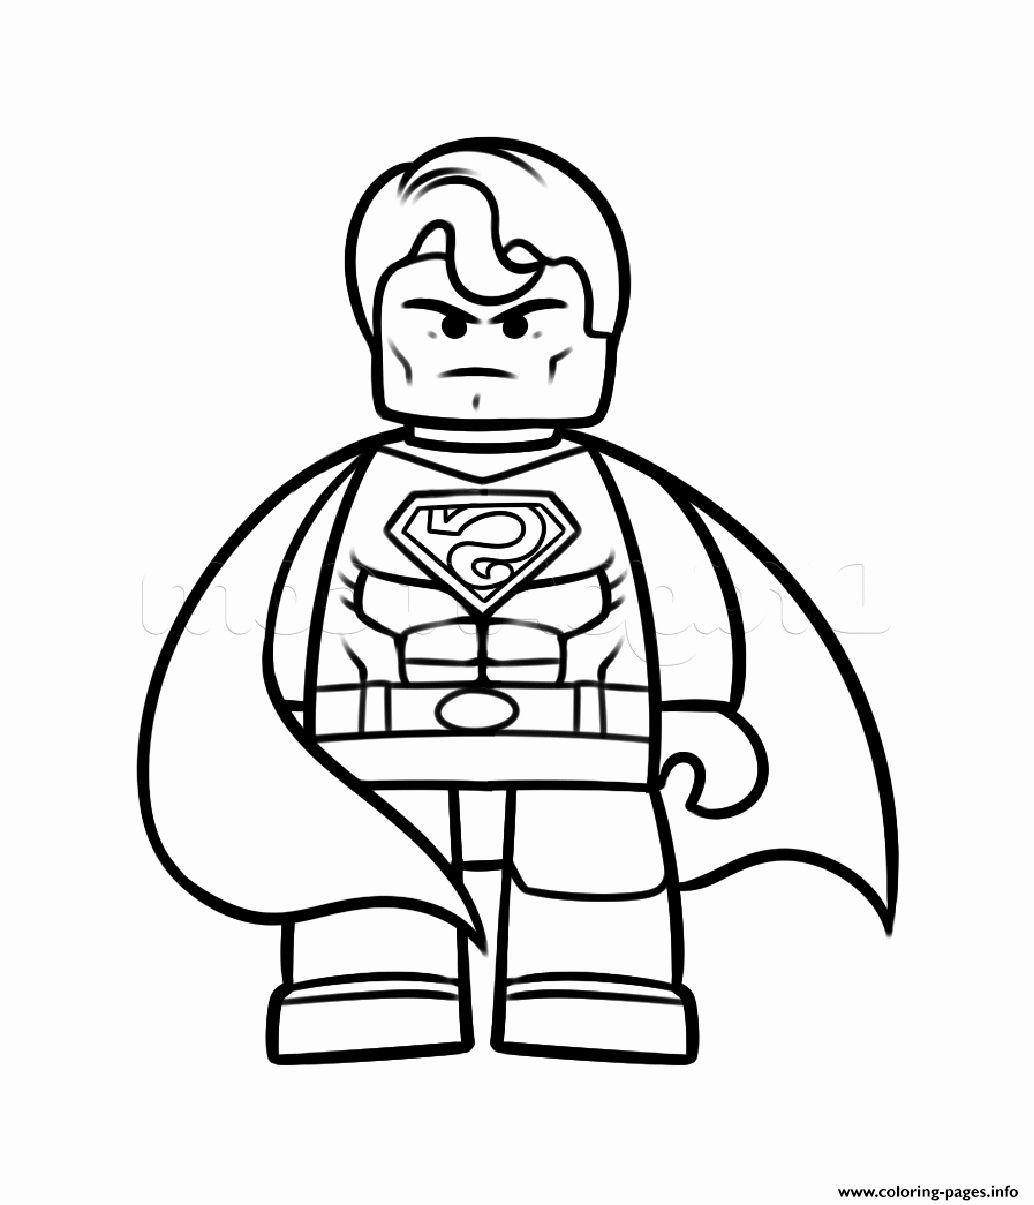 Batman Vs Superman Coloring Pages Printable Lovely Superman Vs